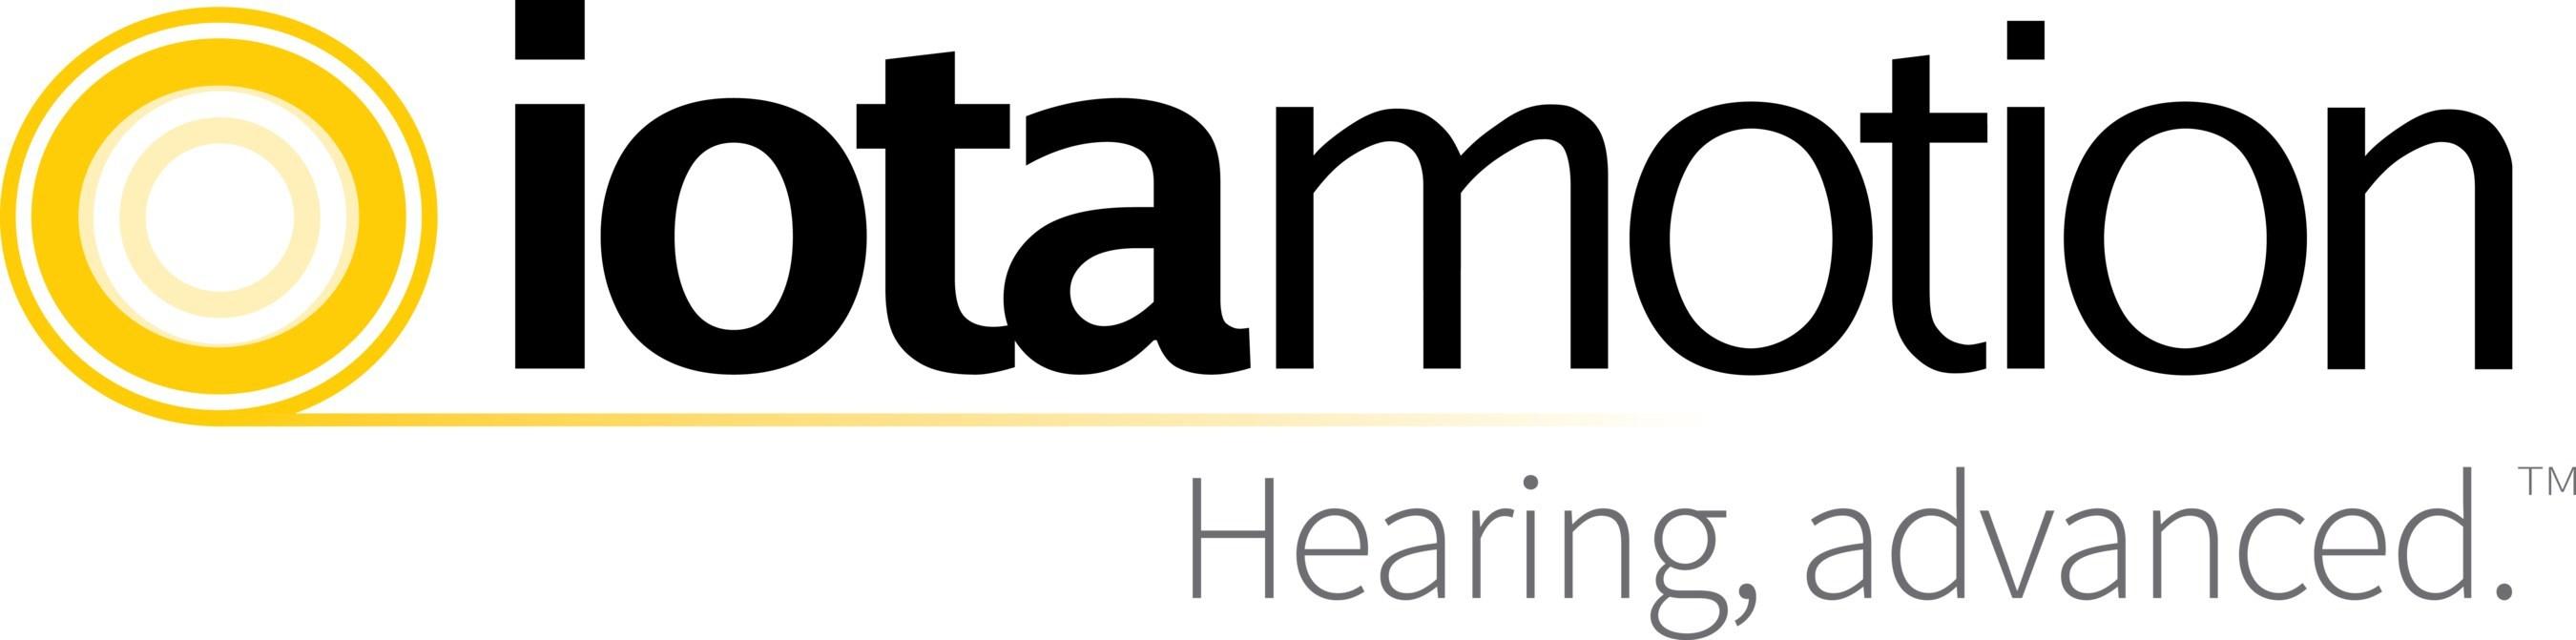 iotaMotion Raises $2 52M In Second Funding   FinSMEs